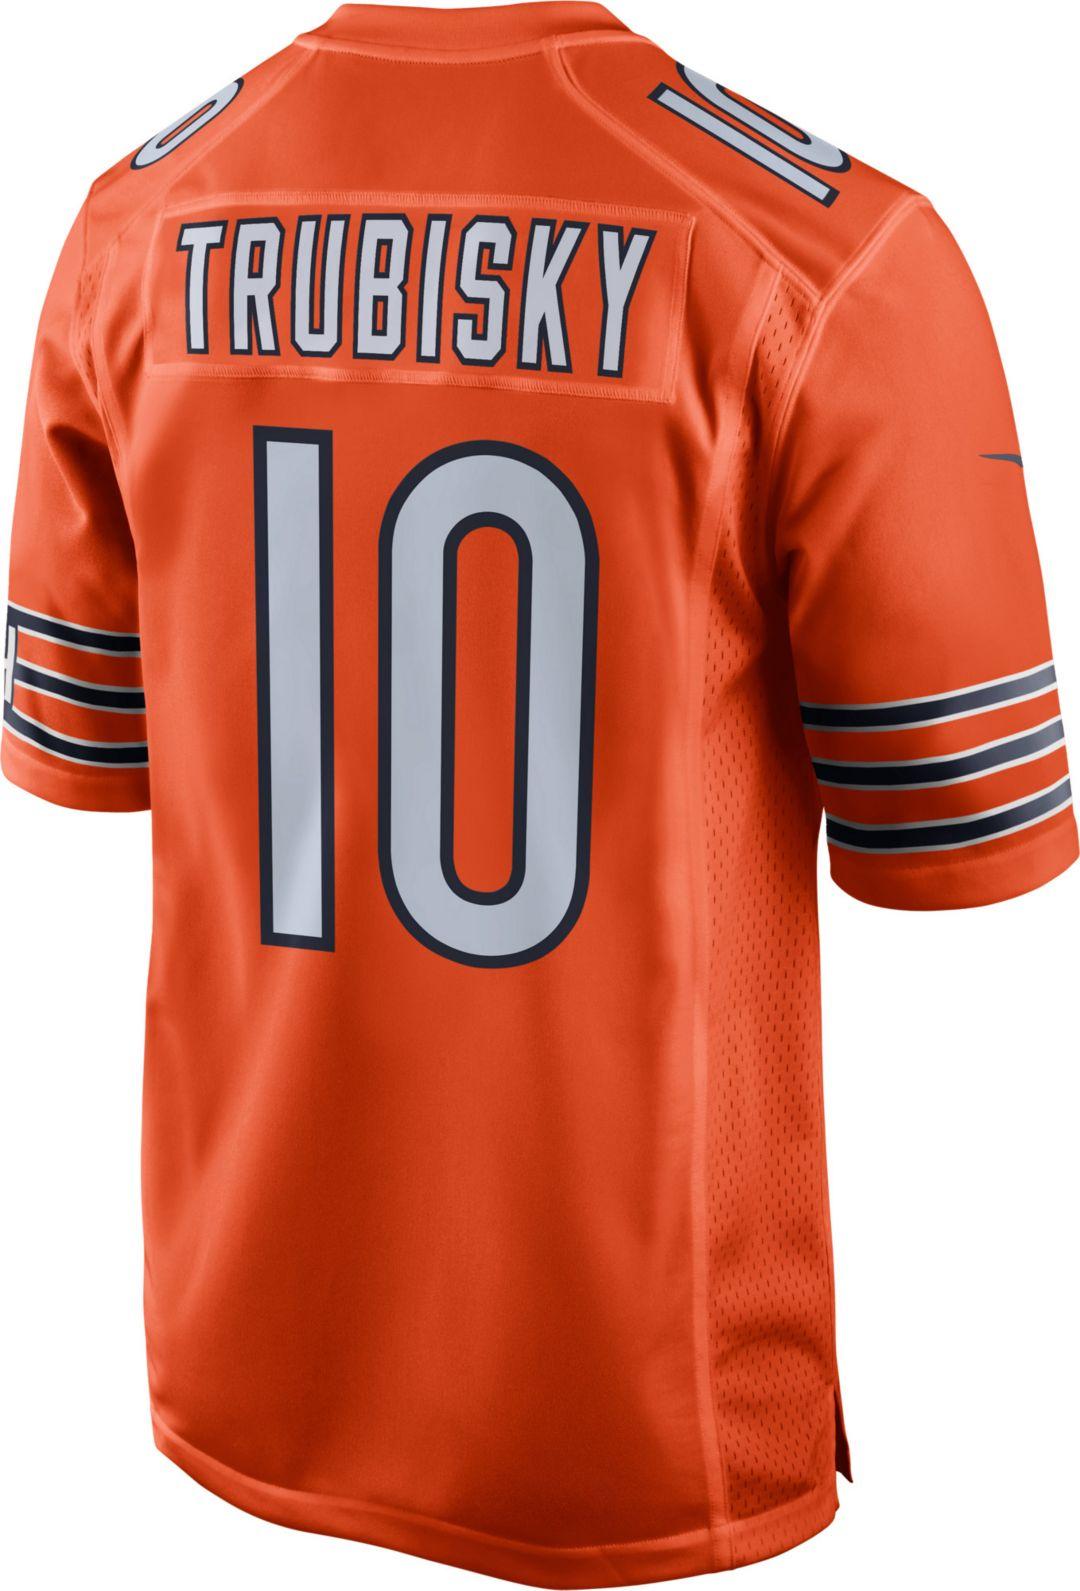 designer fashion a1ecd 6f41b Nike Youth Alternate Game Jersey Chicago Bears Mitchell Trubisky #10